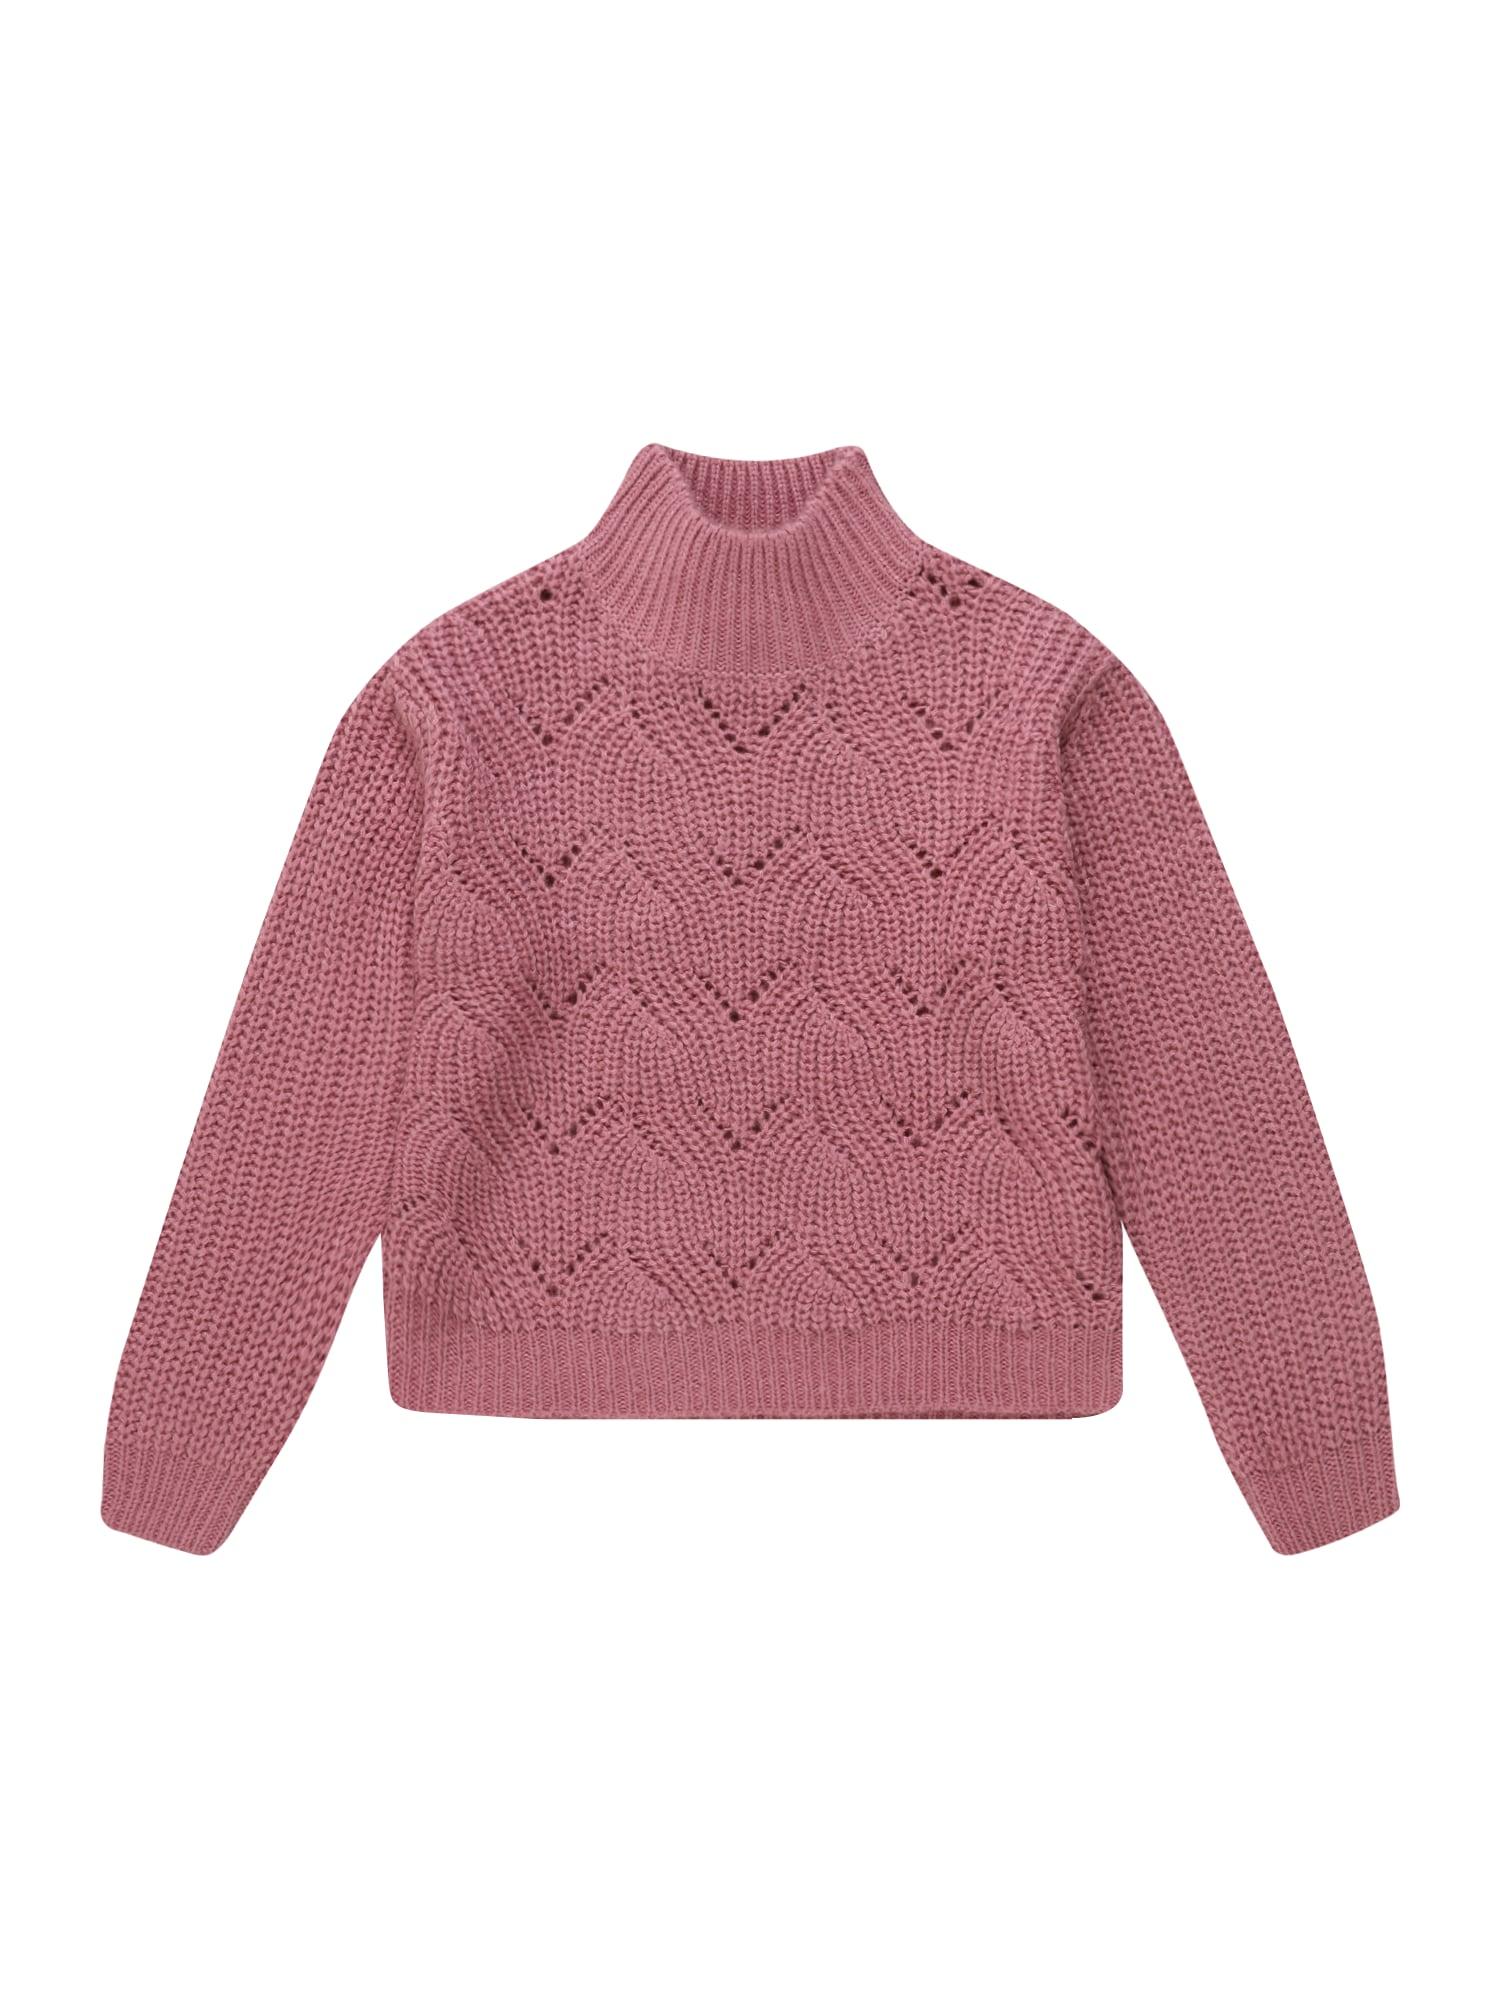 BLUE SEVEN Megztinis rausvai violetinė spalva